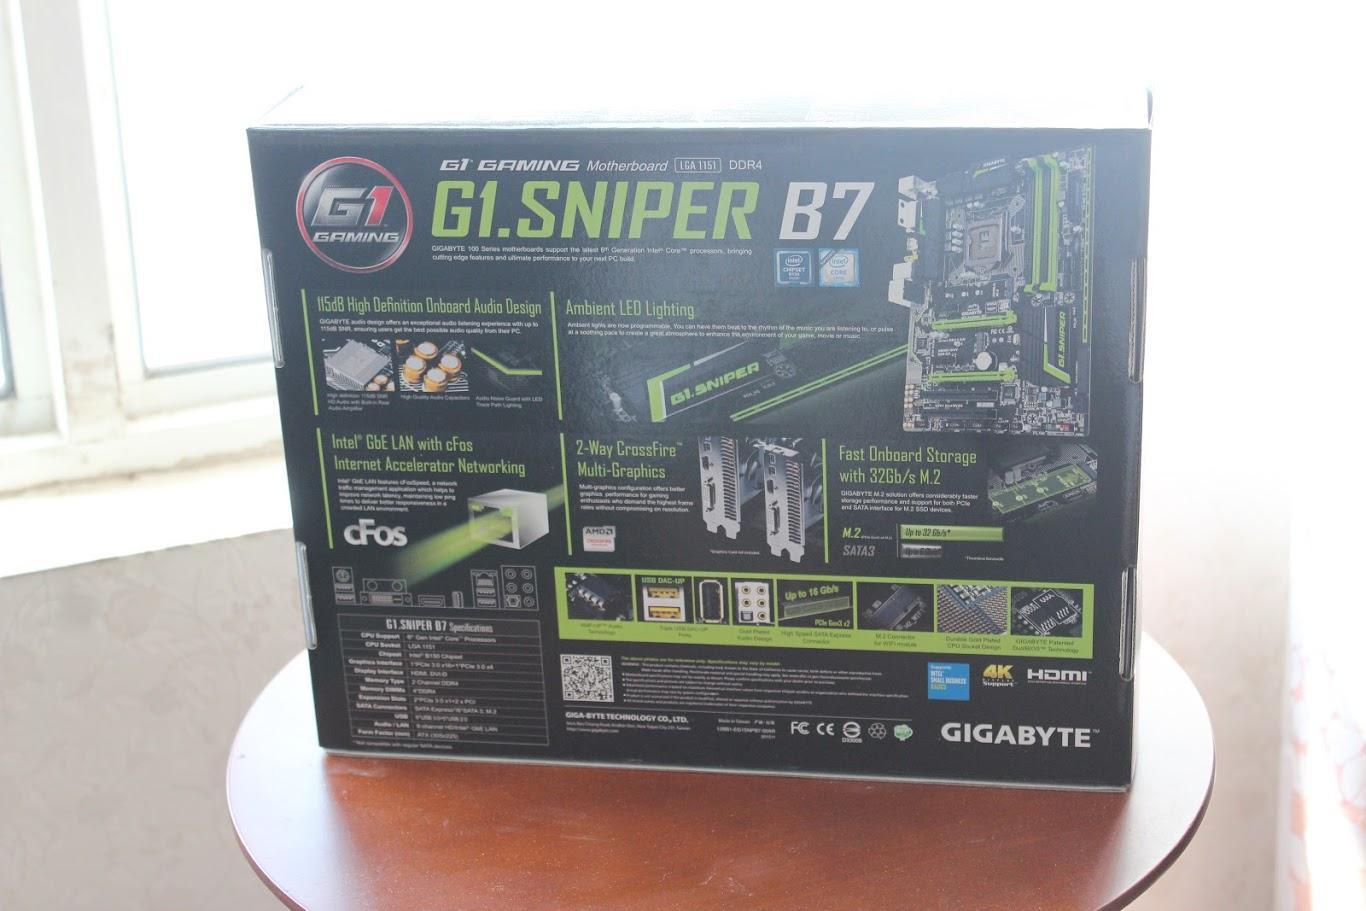 gigabyte-g1-sniper-b7-xa-thu-vao-tam (2)